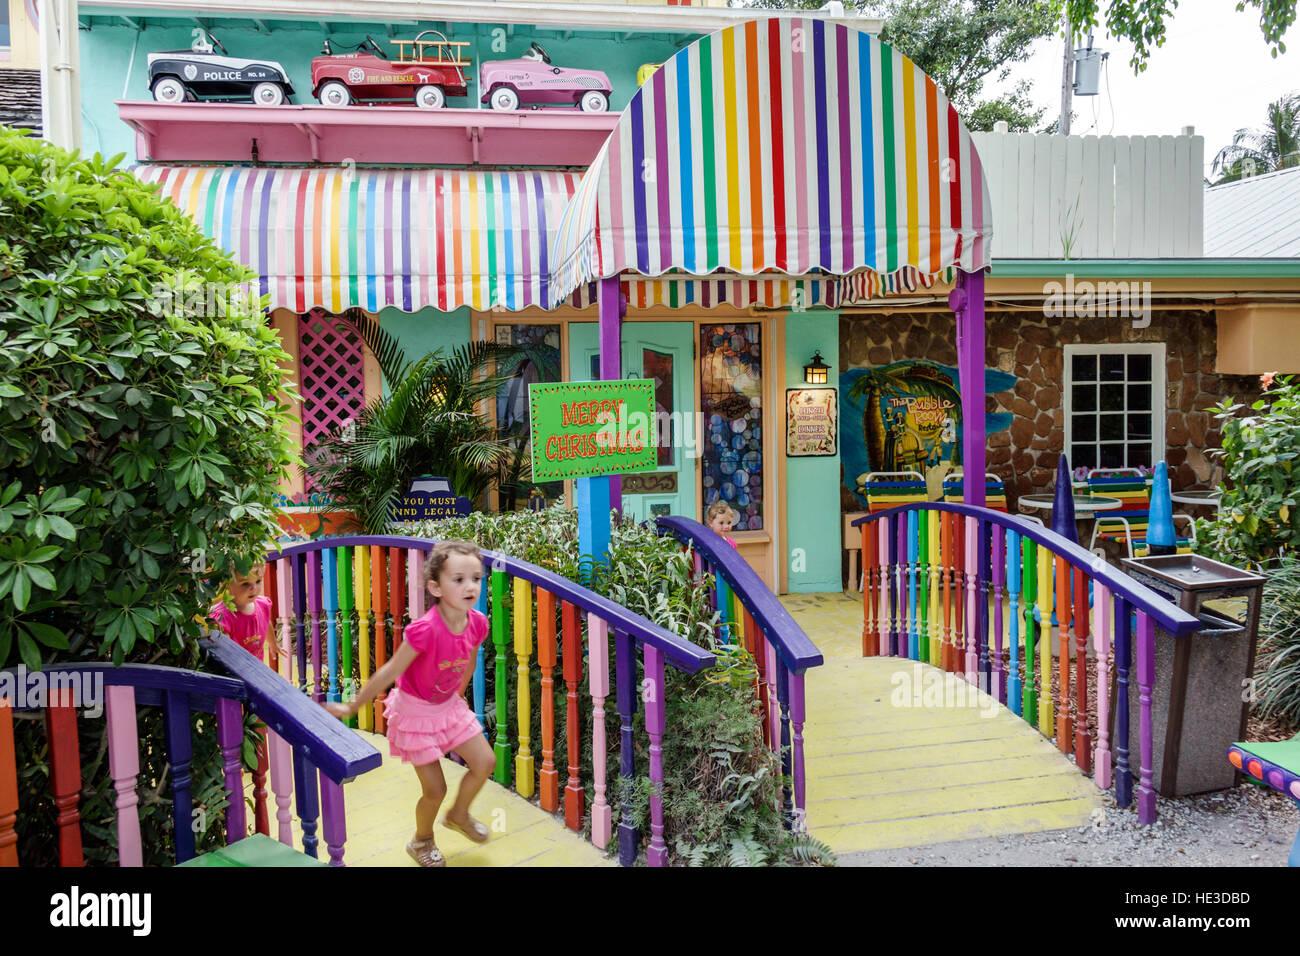 Florida Captiva Island The Bubble Room restaurant exterior - Stock Image